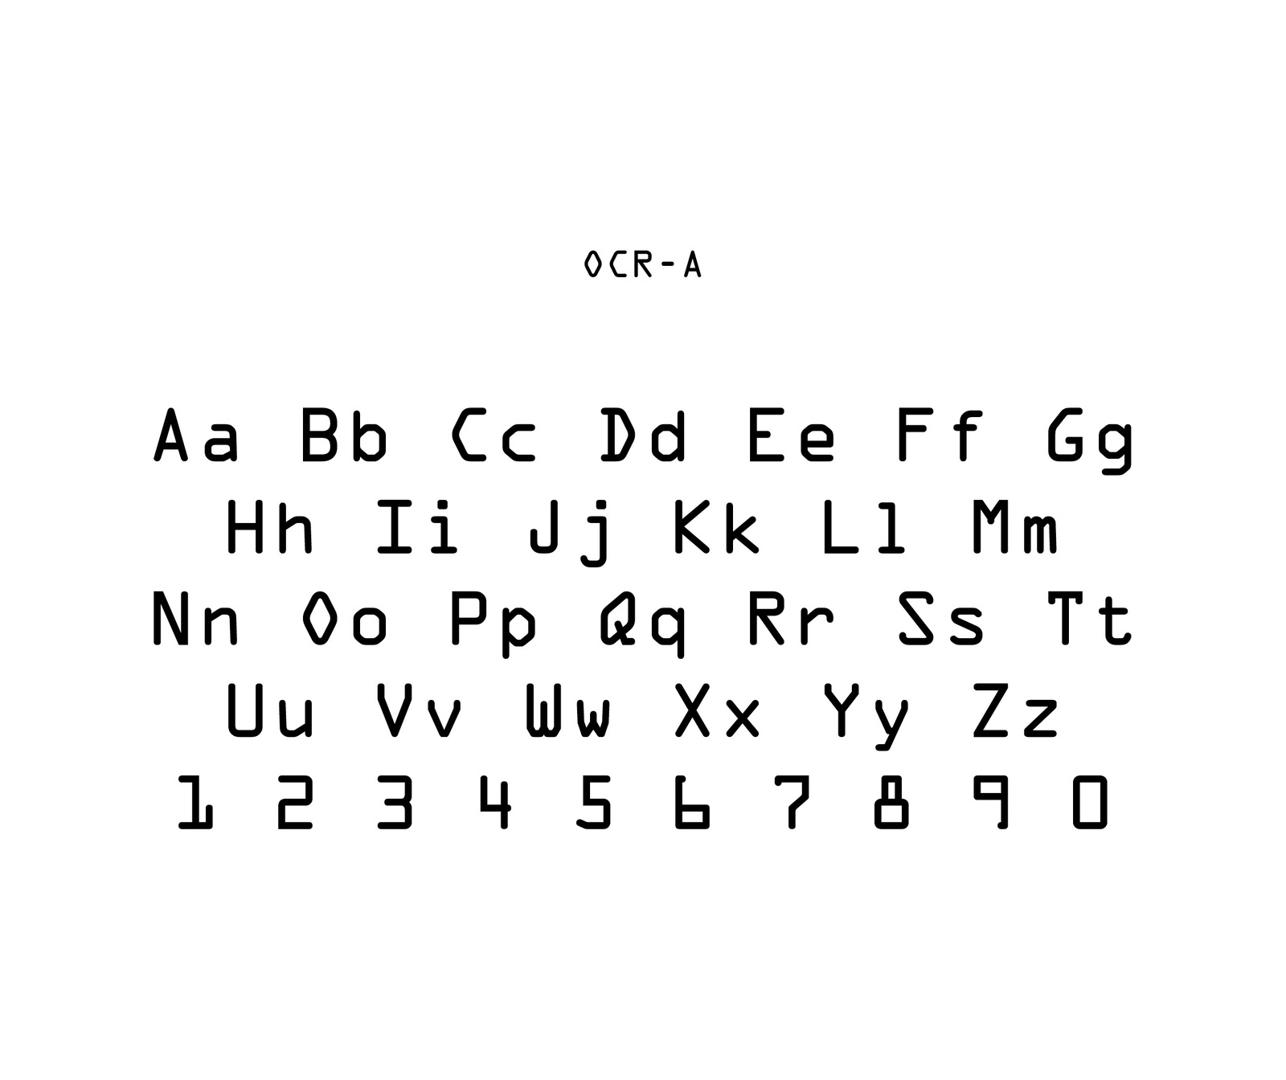 OCR-A 1966 image